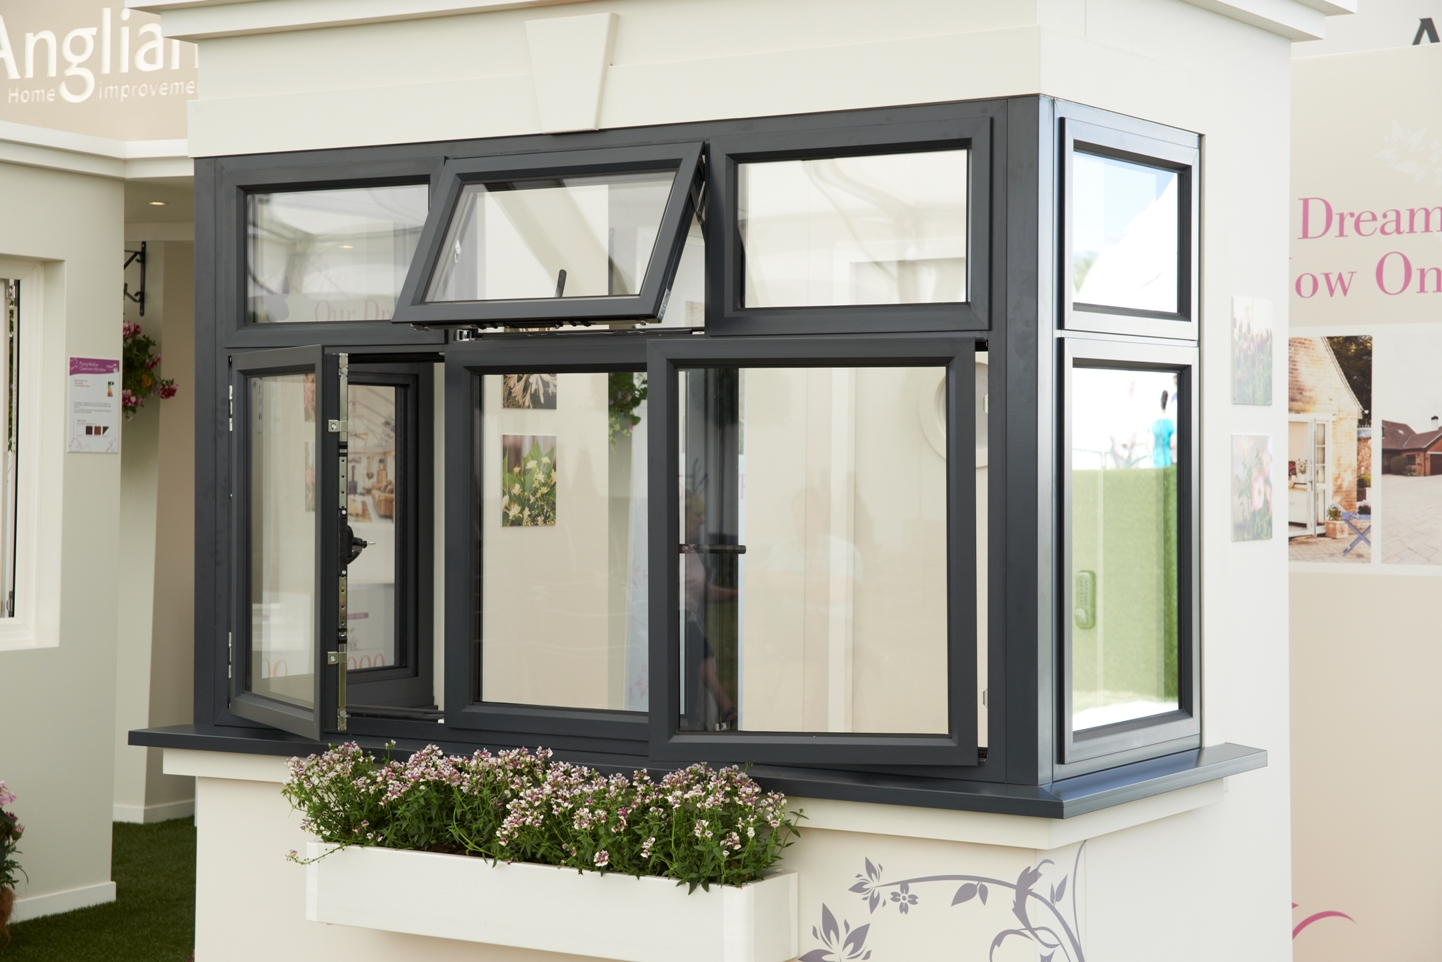 Powder Coated Windows : Anglian launches new range of aluminium windows and doors